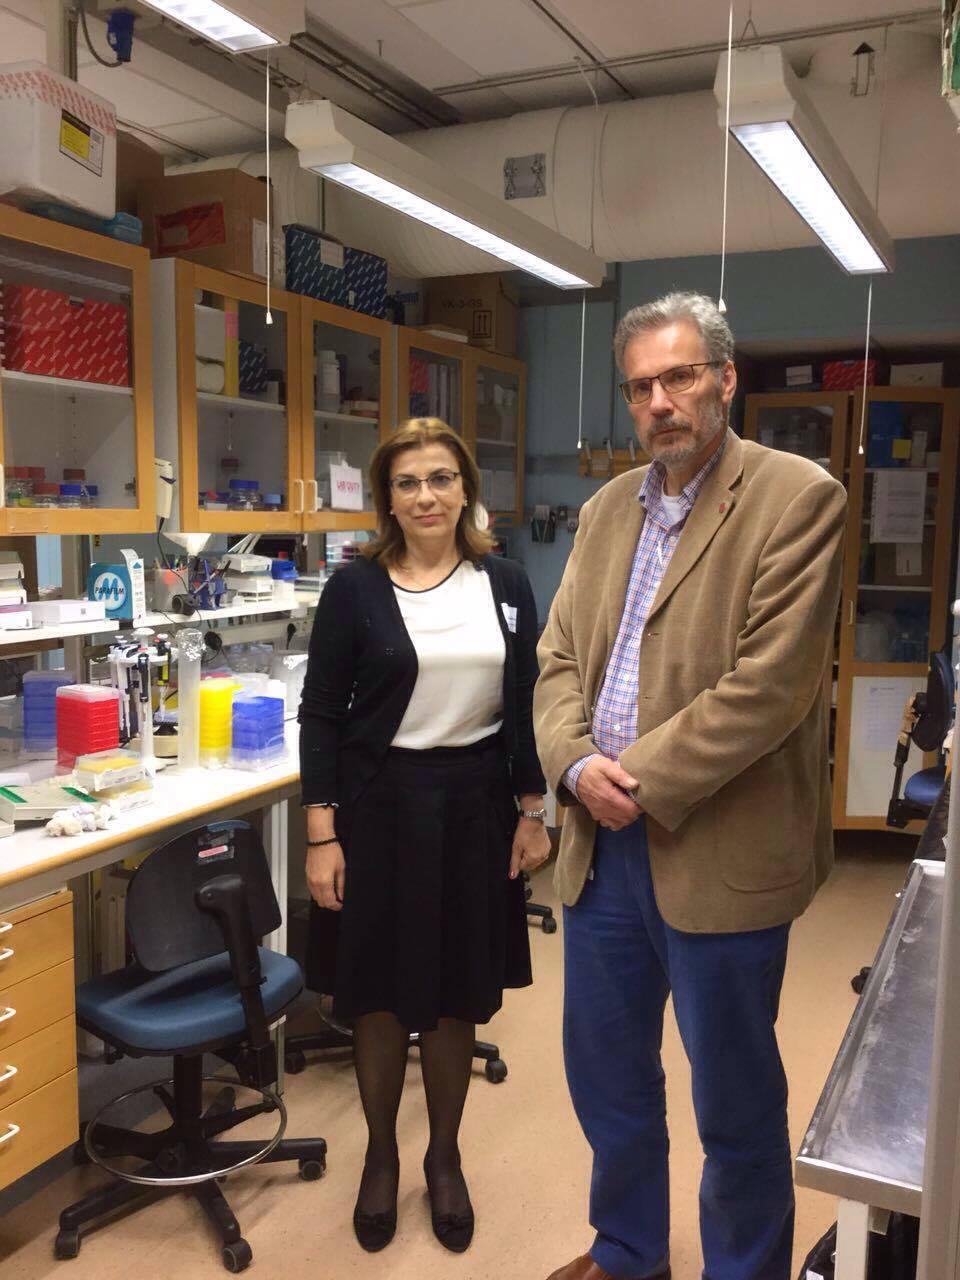 Head of Biological Sciences Department Visits Uppsala University in Sweden